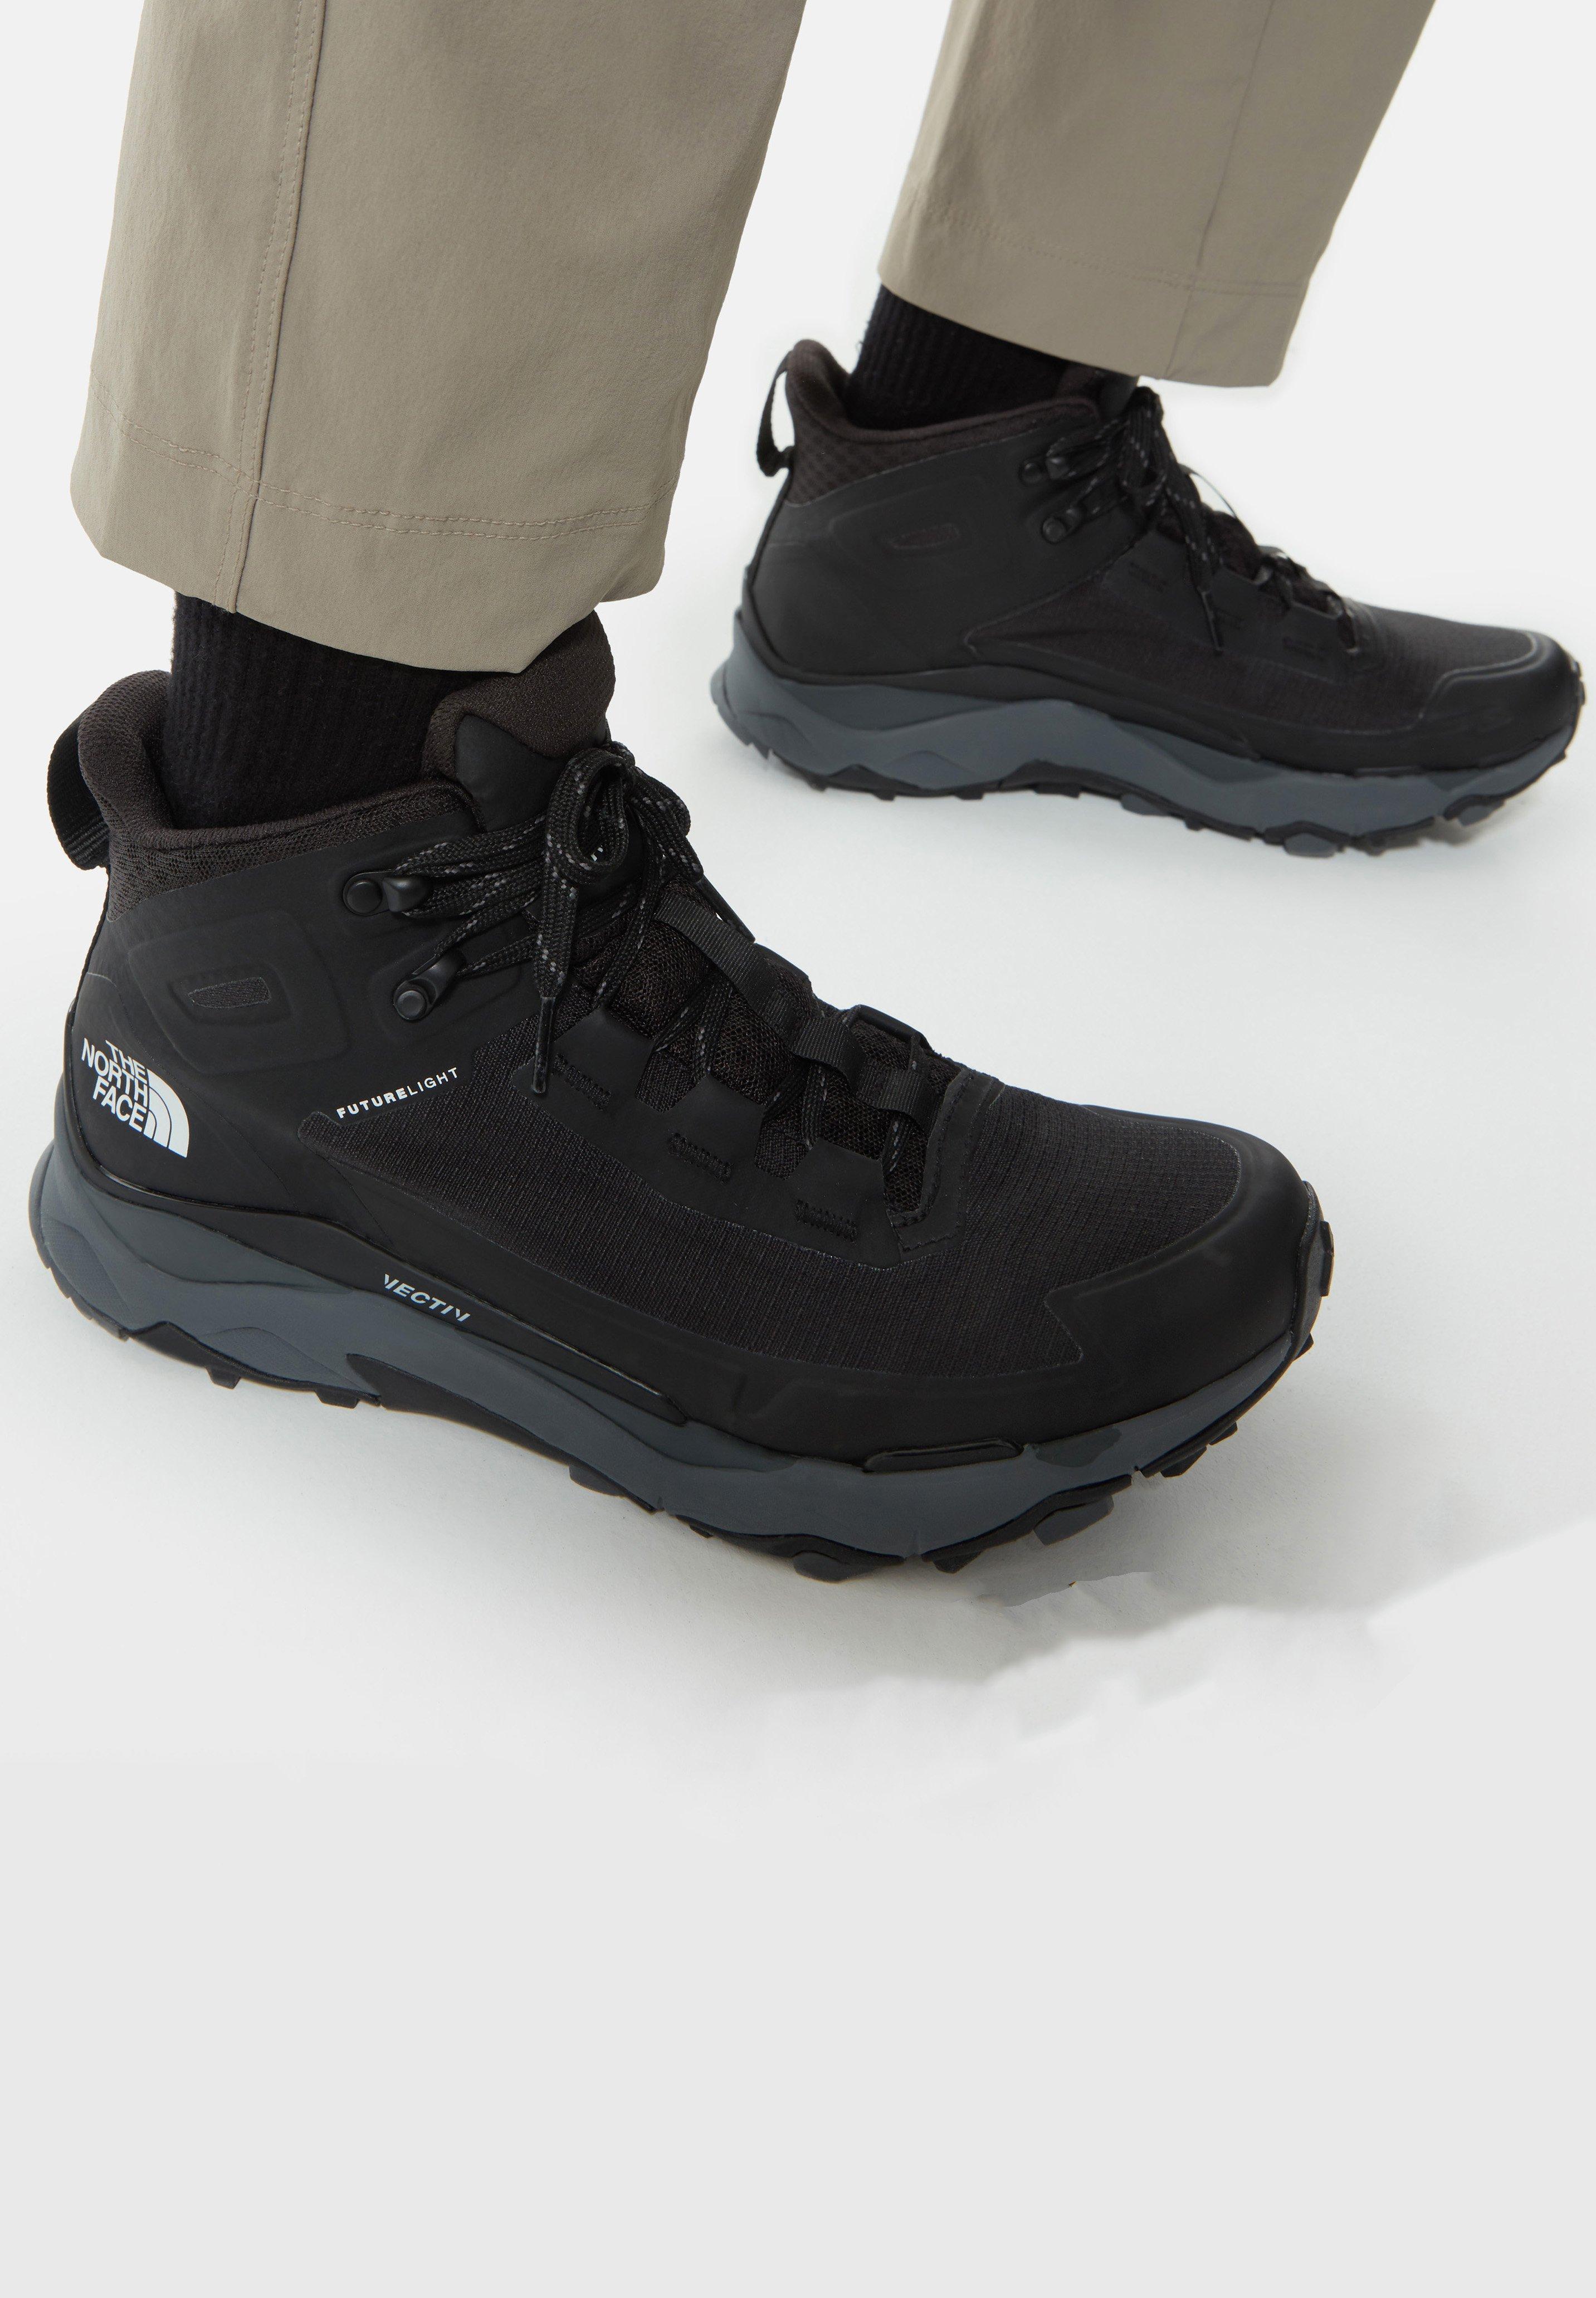 Uomo M VECTIV EXPLORIS MID FUTURELIGHT - Scarpa da hiking